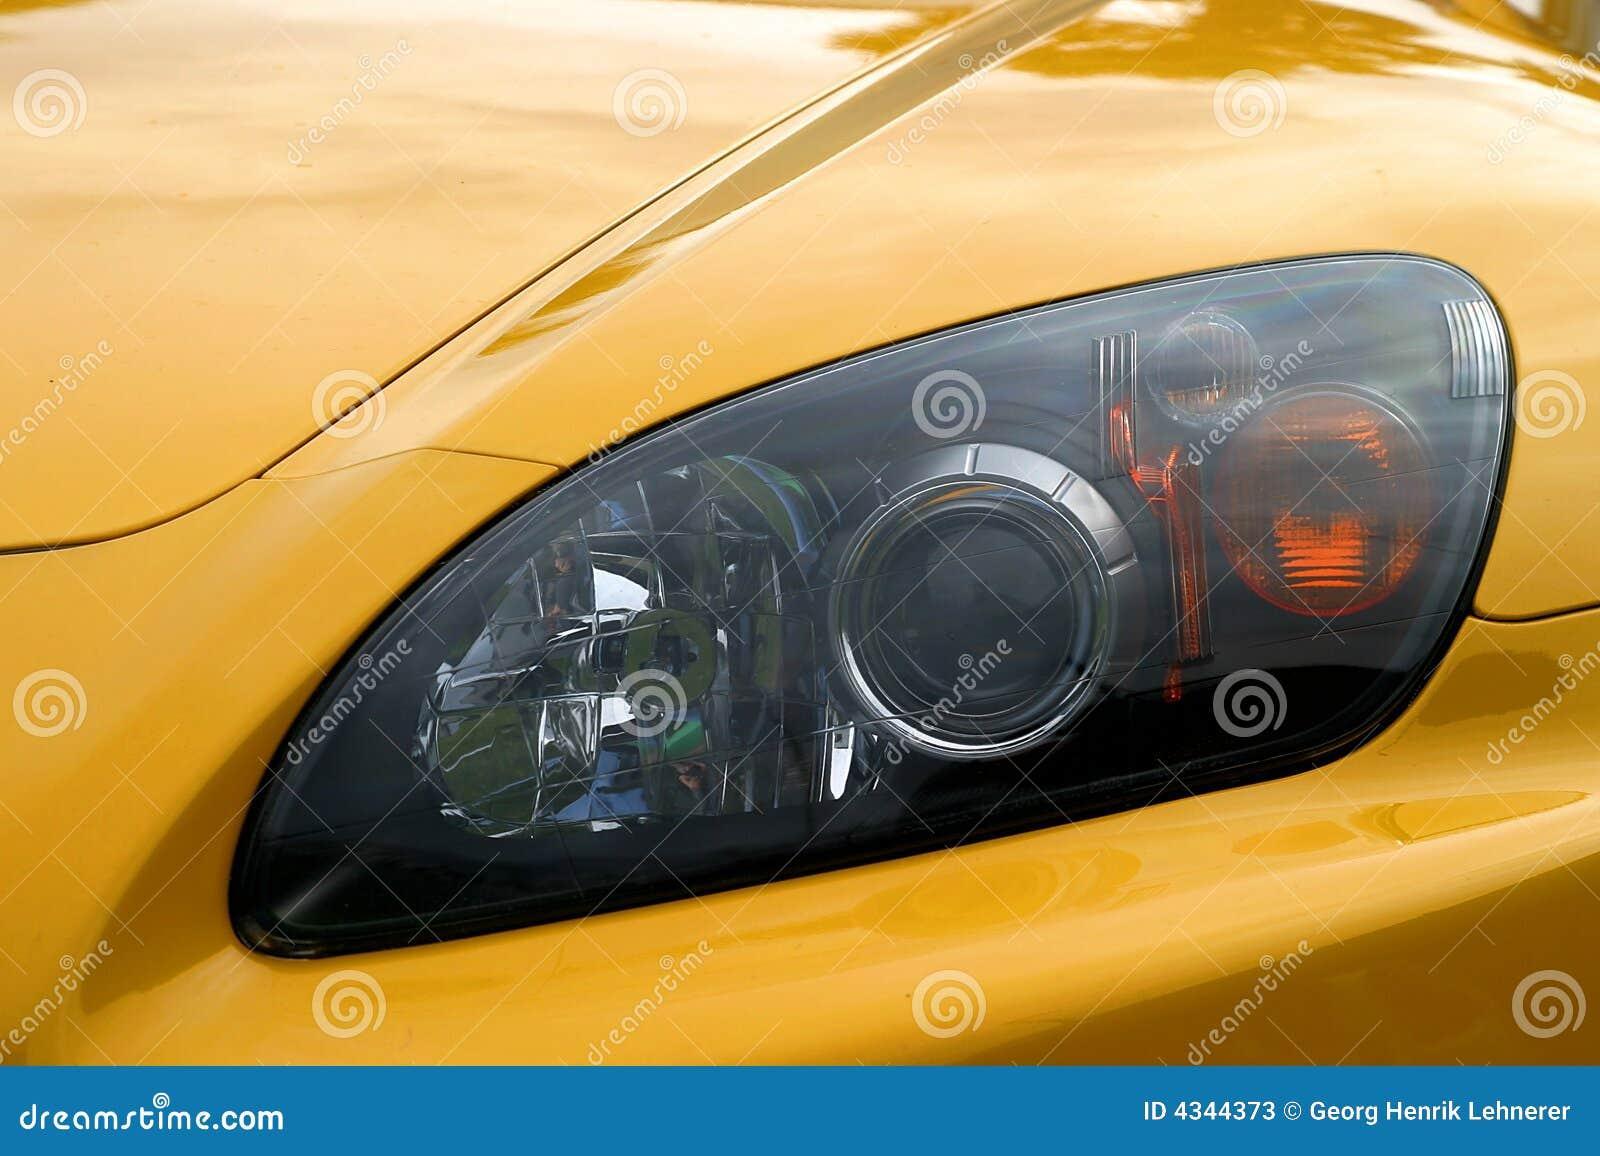 Eye Of A Car